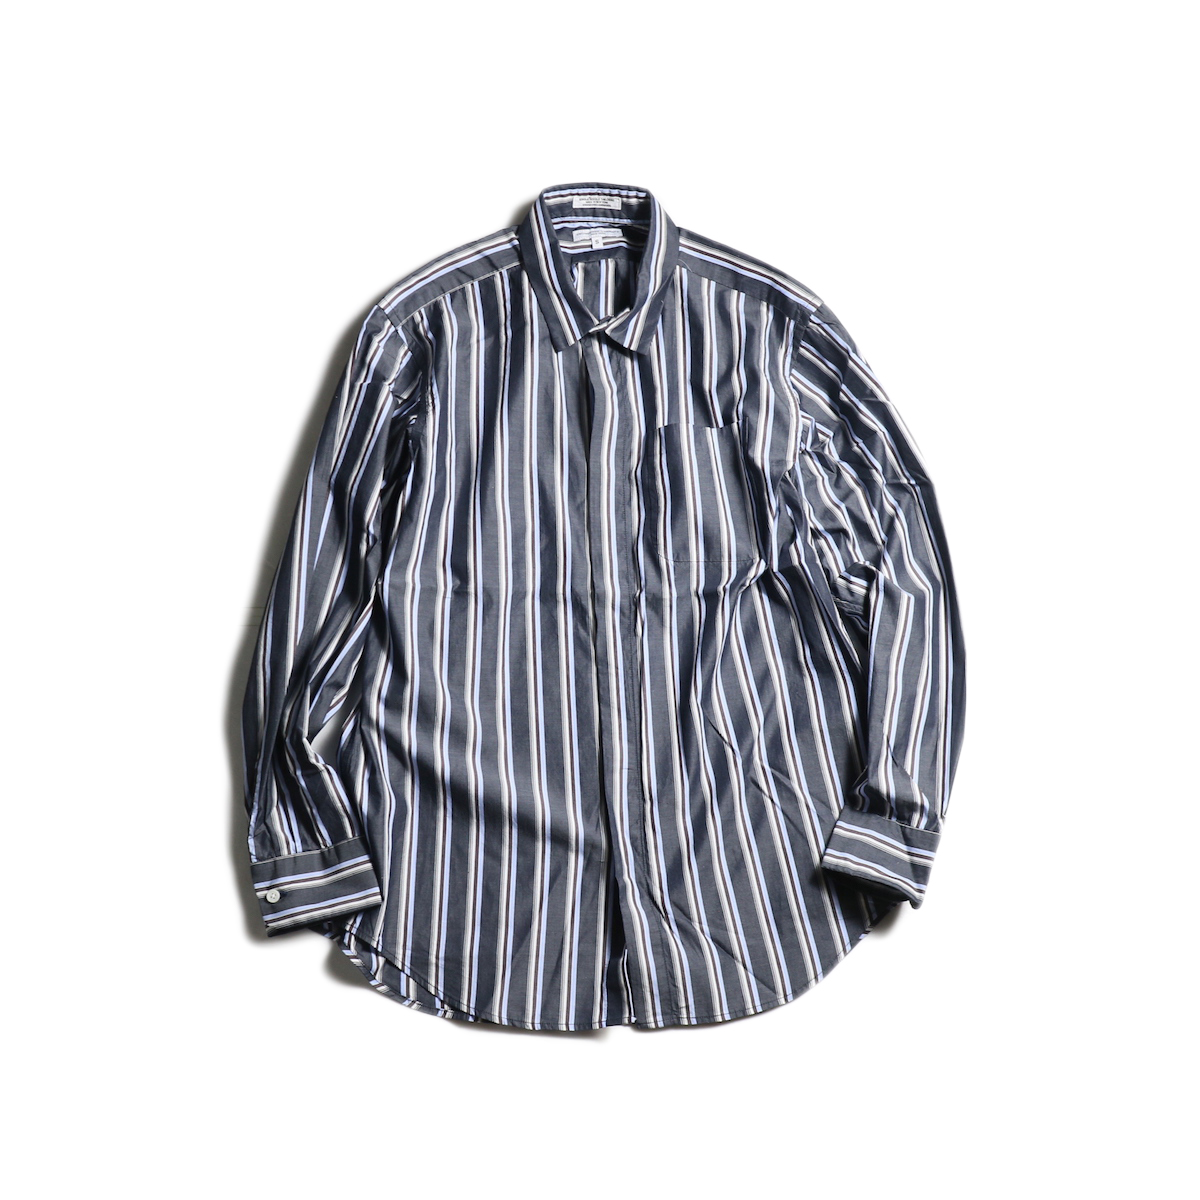 Engineered Garments / Short Collar Shirt -Multi St. Broadcloth (Navy)